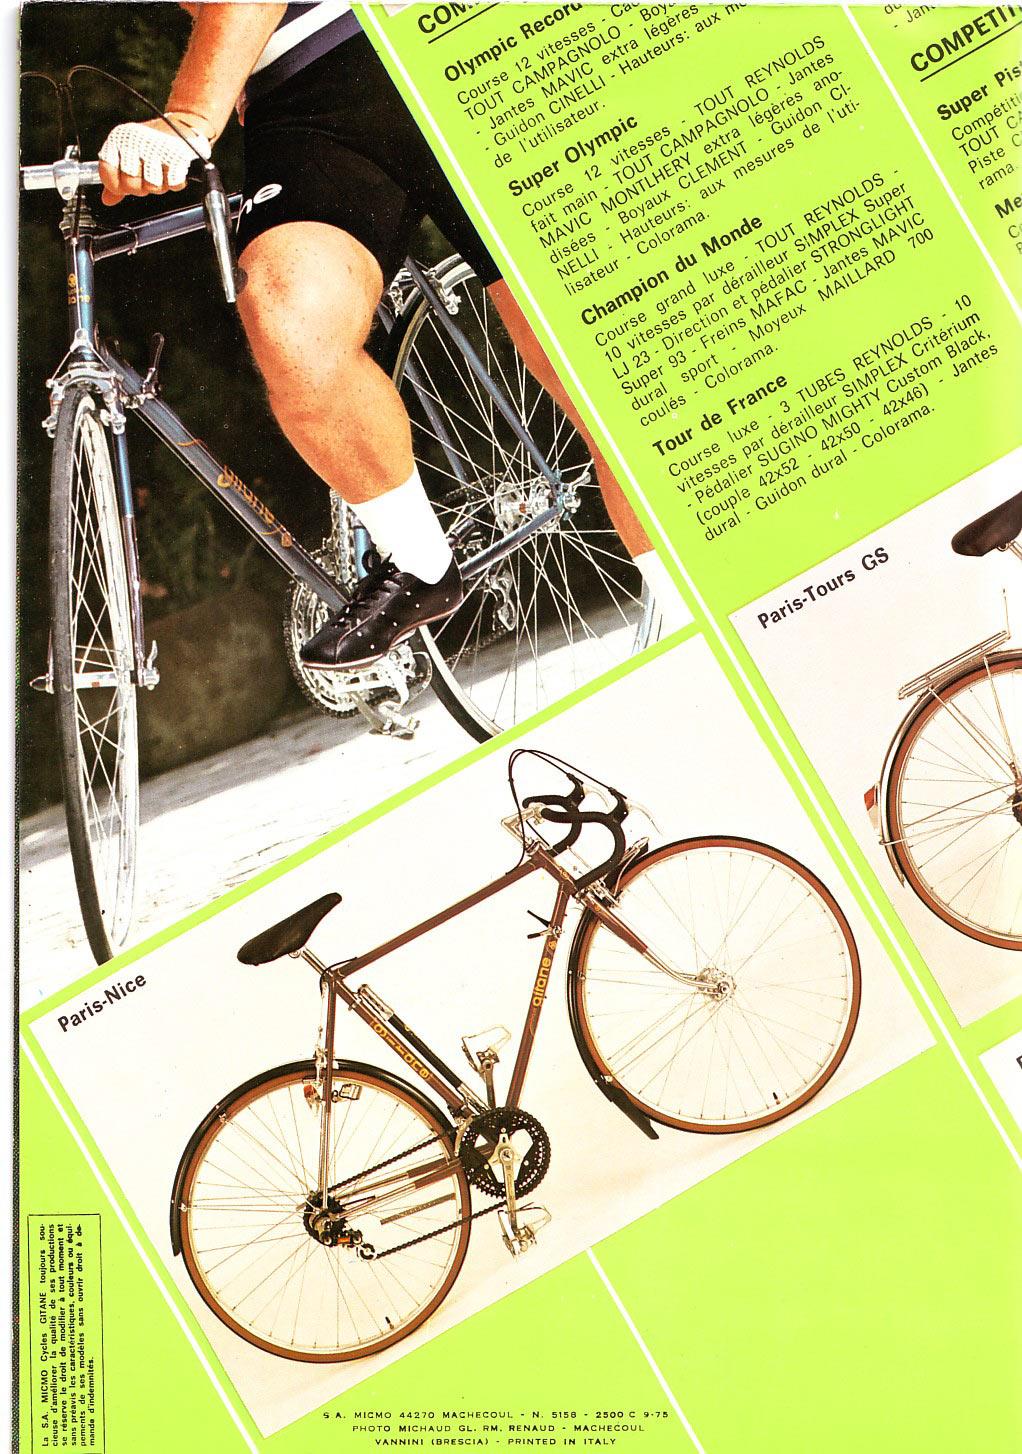 Gitane Super Olympic 1975 ? - Page 3 Fr_19710